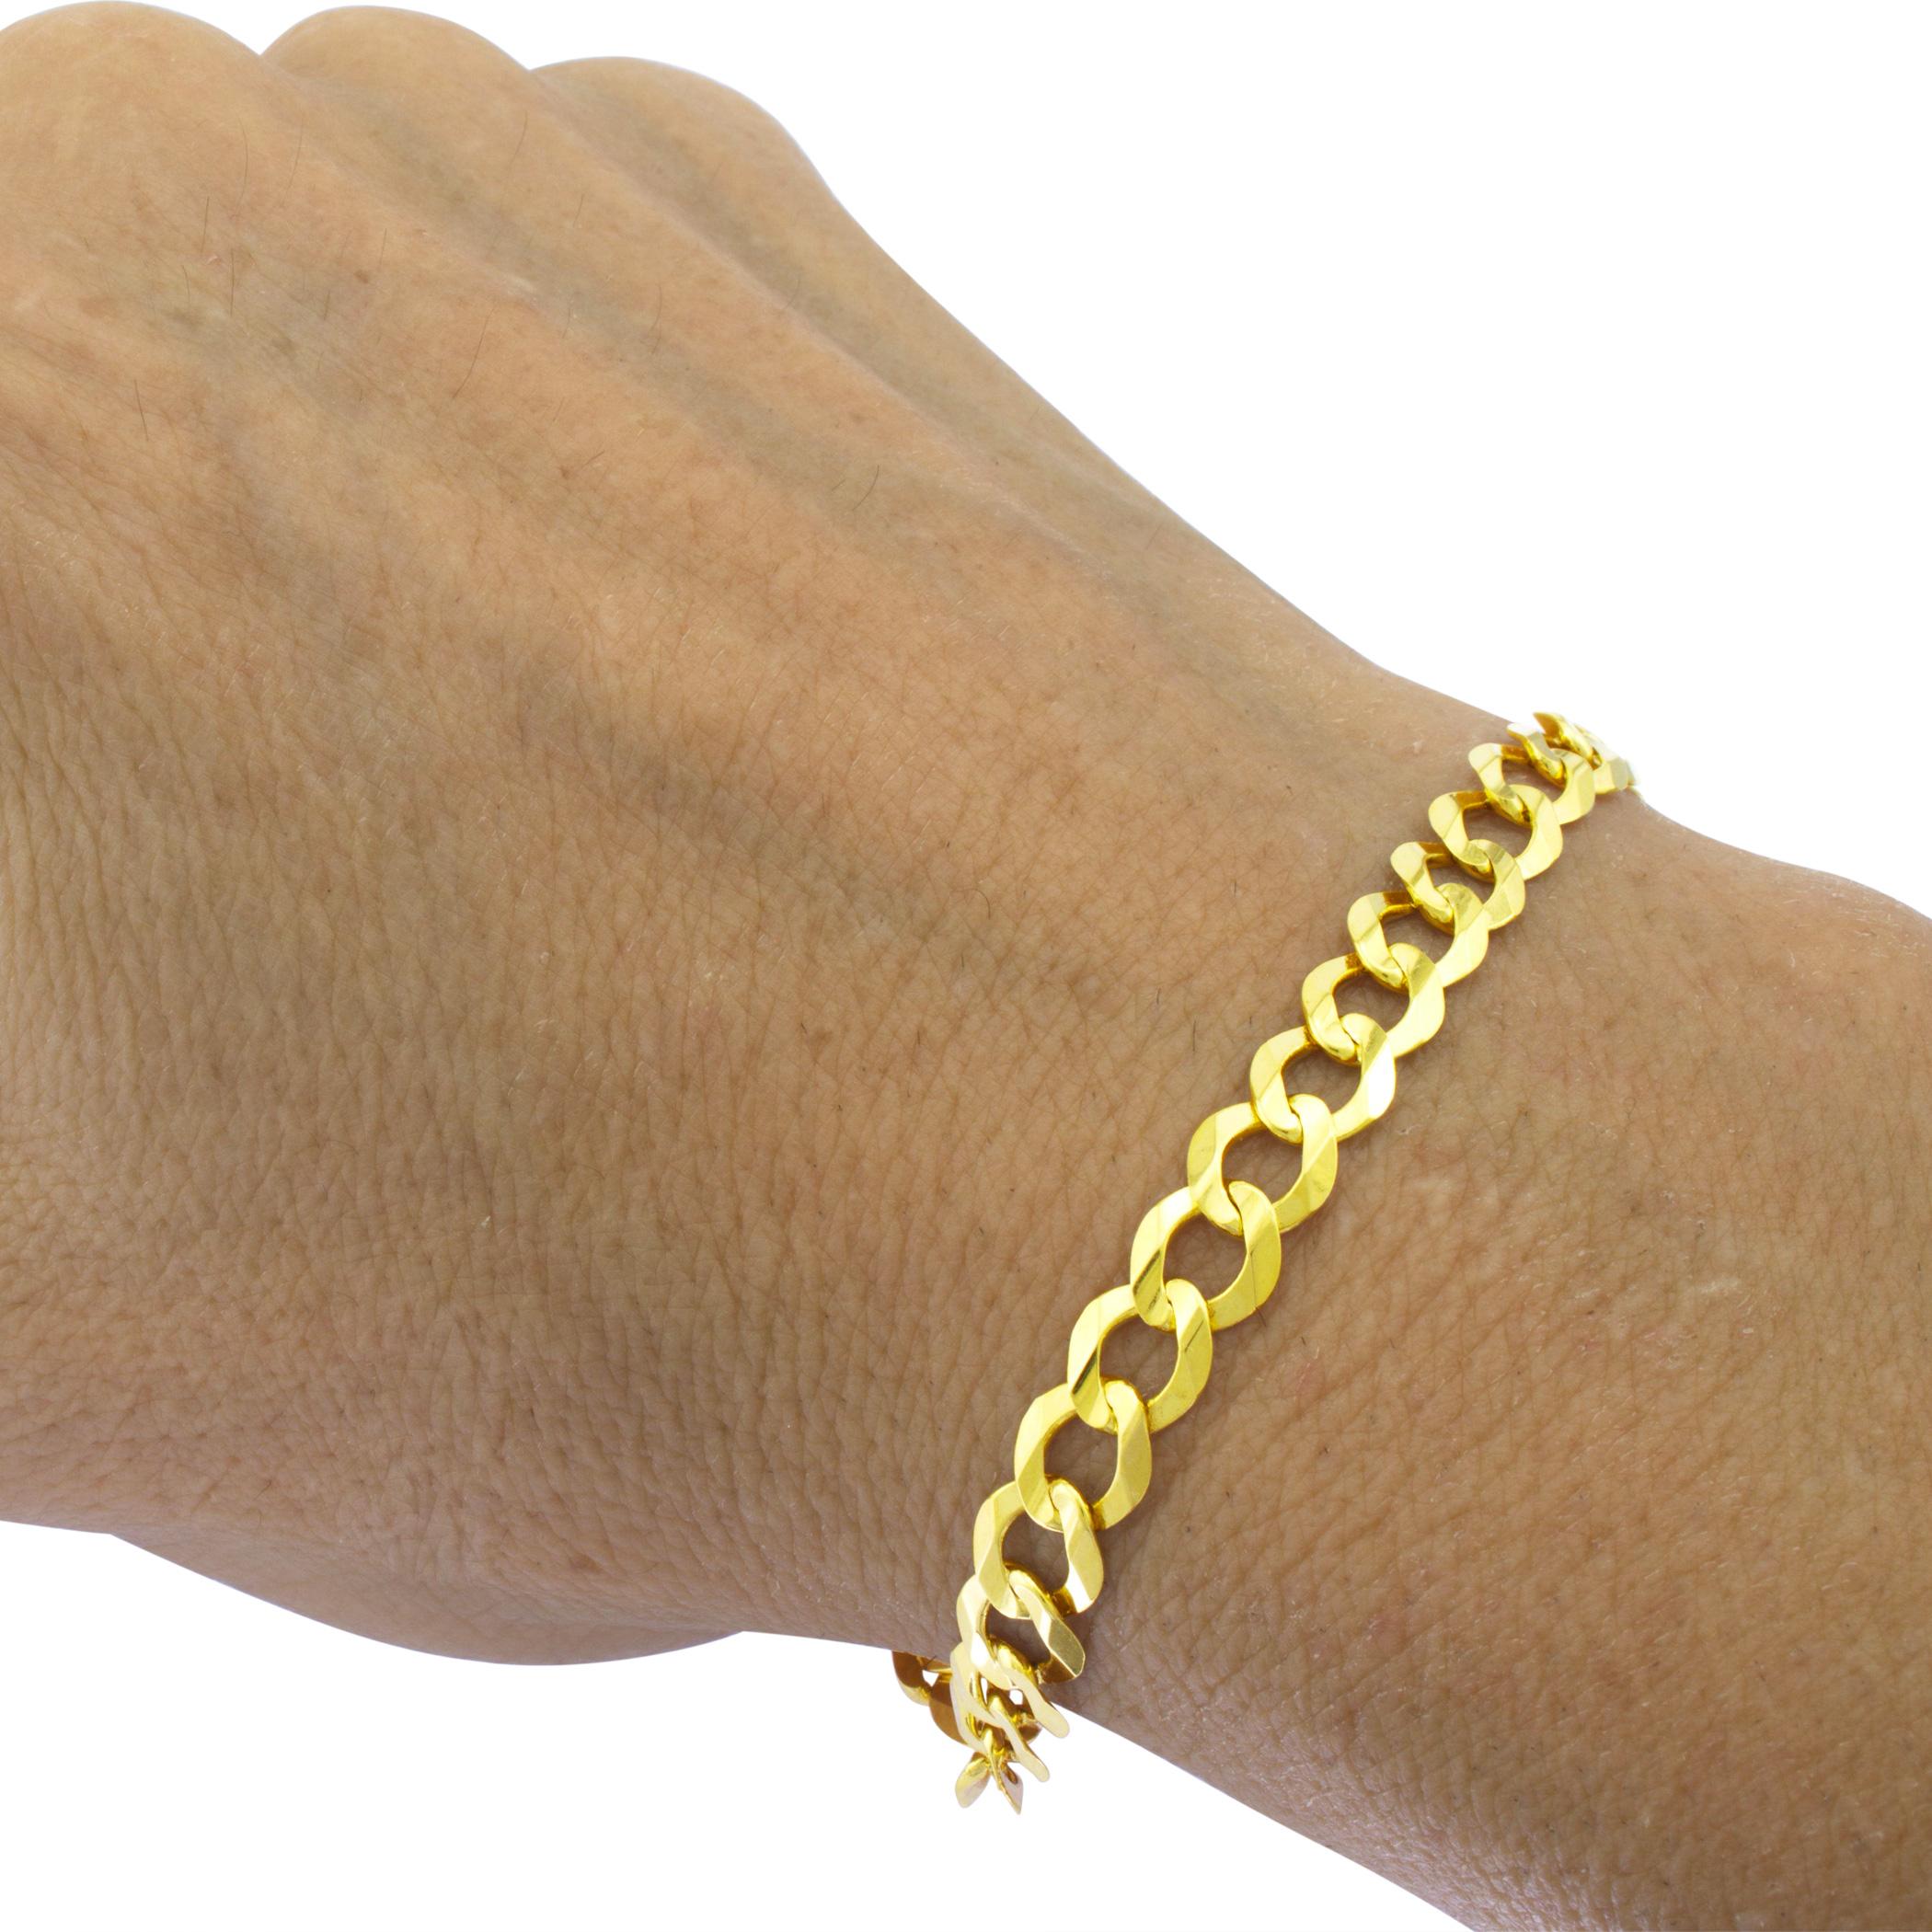 Cadenas De Oro Italiano 14k: 14k Oro Amarillo 6.5mm Italiano Cordón Cubano Brazalete